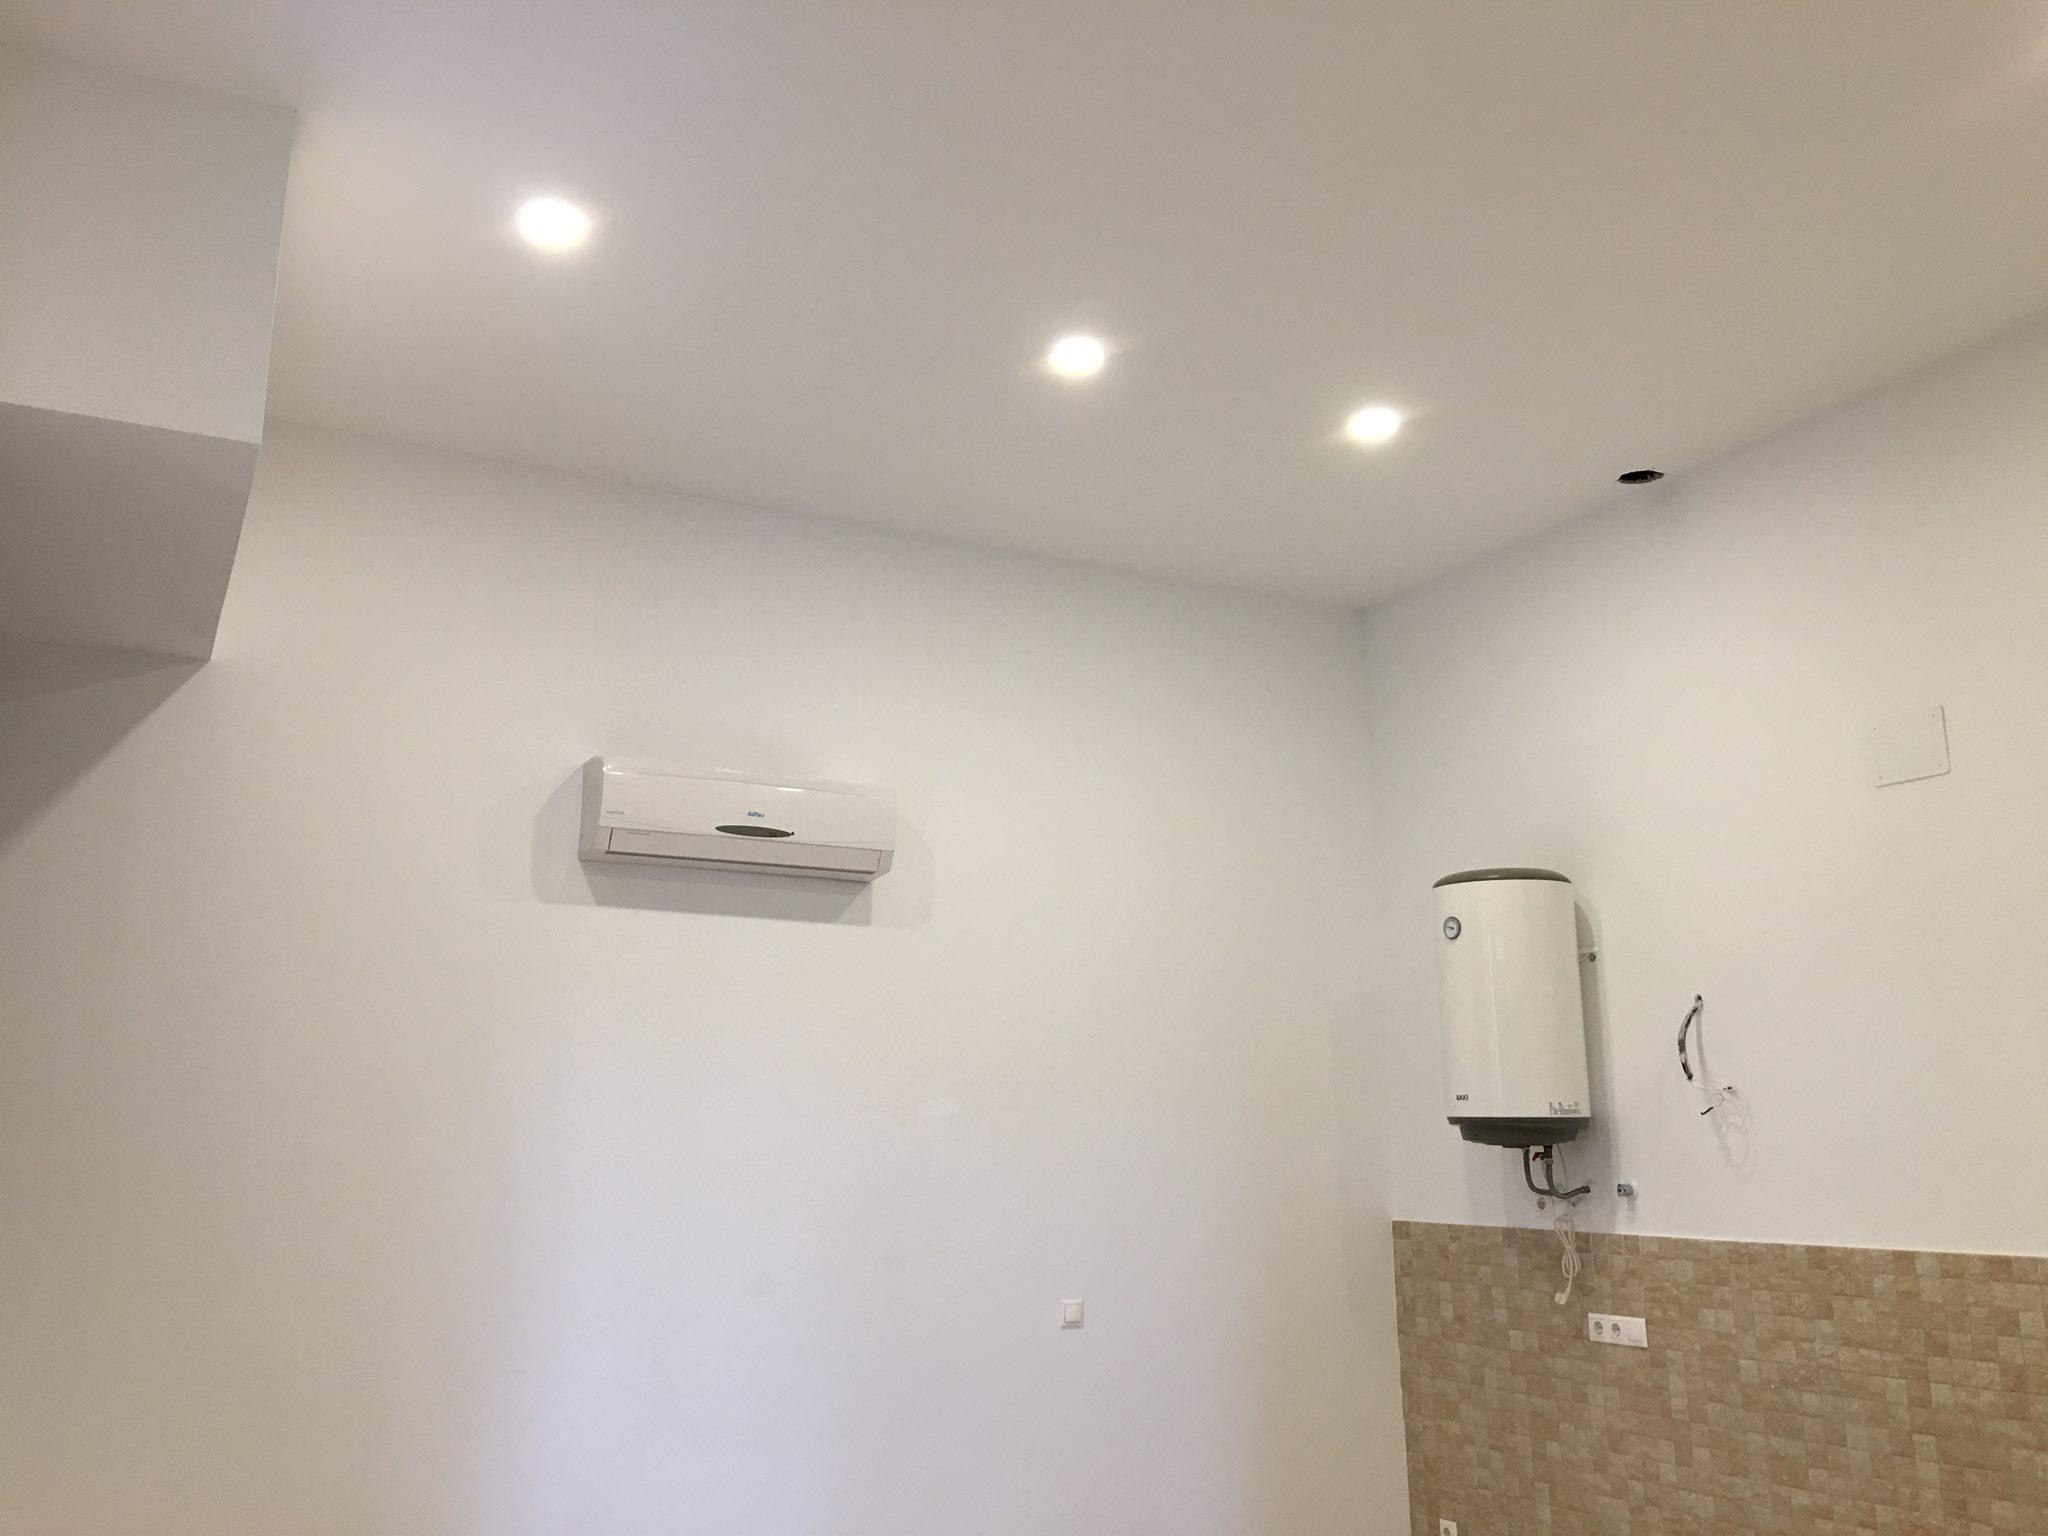 http://www.metelcor.es/wp-content/uploads/2016/04/metelcor-instalacion-electrica-loft-calle-betis-6.jpg